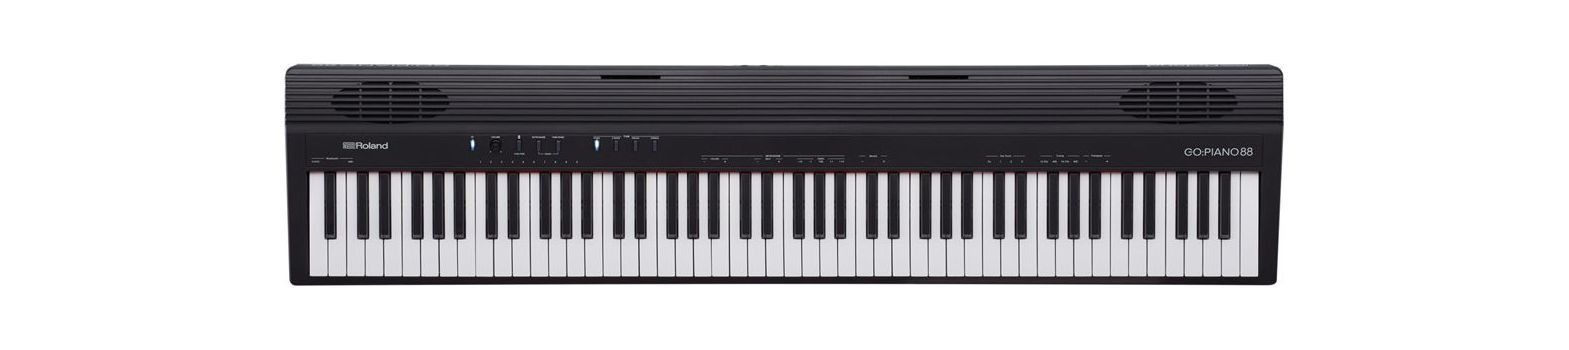 Roland GO:PIANO88 - Pian Digital Portabil